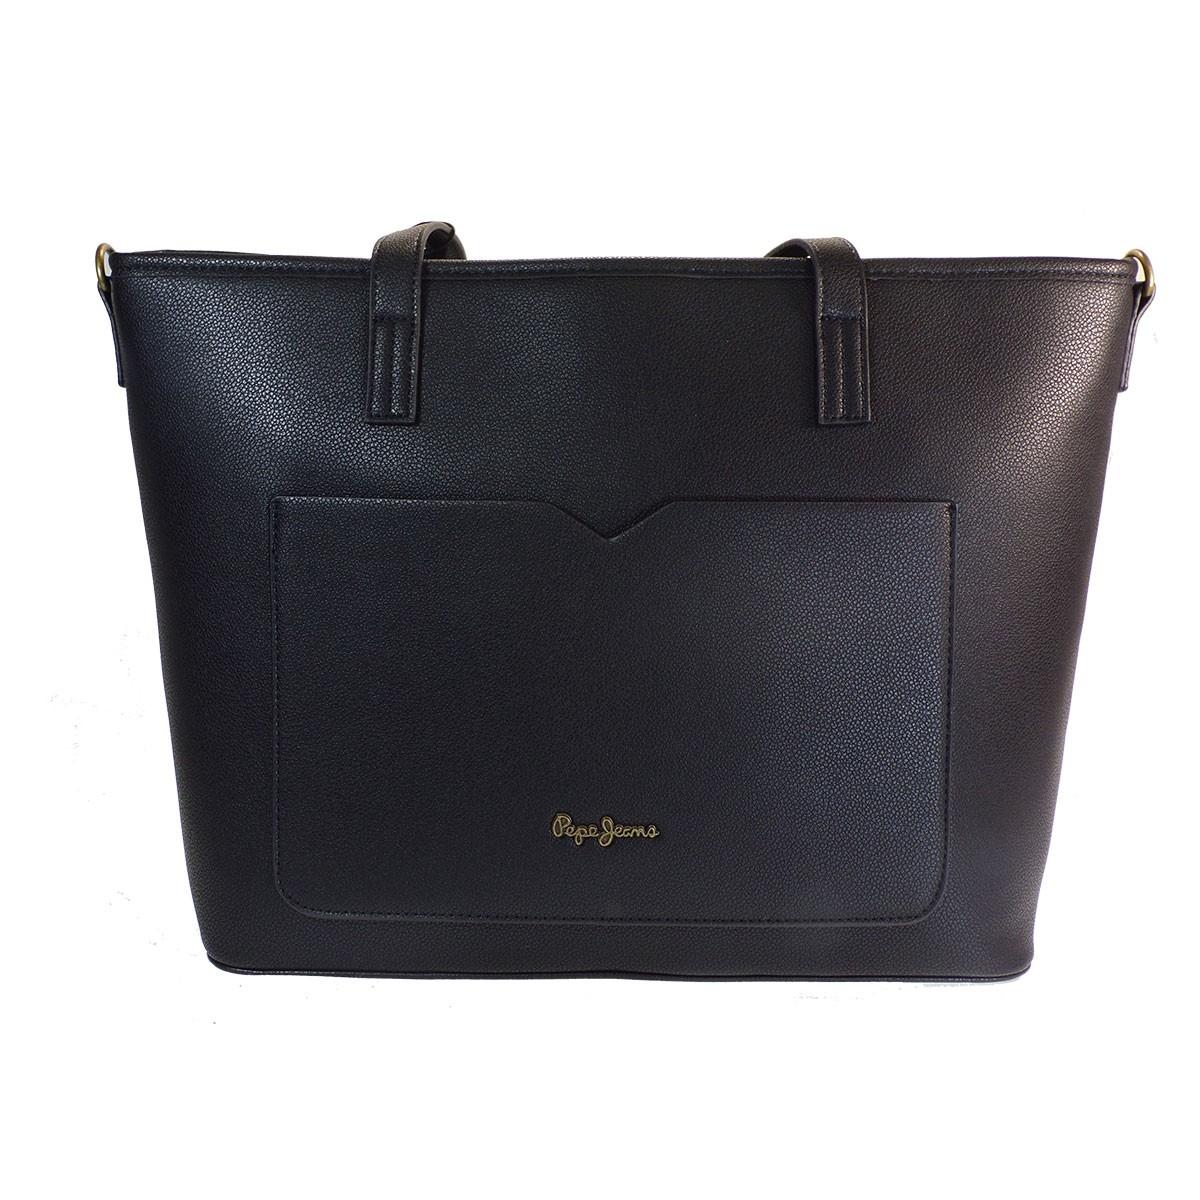 Pepe Jeans BAGS Γυναικεία Τσάντα Ώμου 7277521 Μαύρο PL032668-999